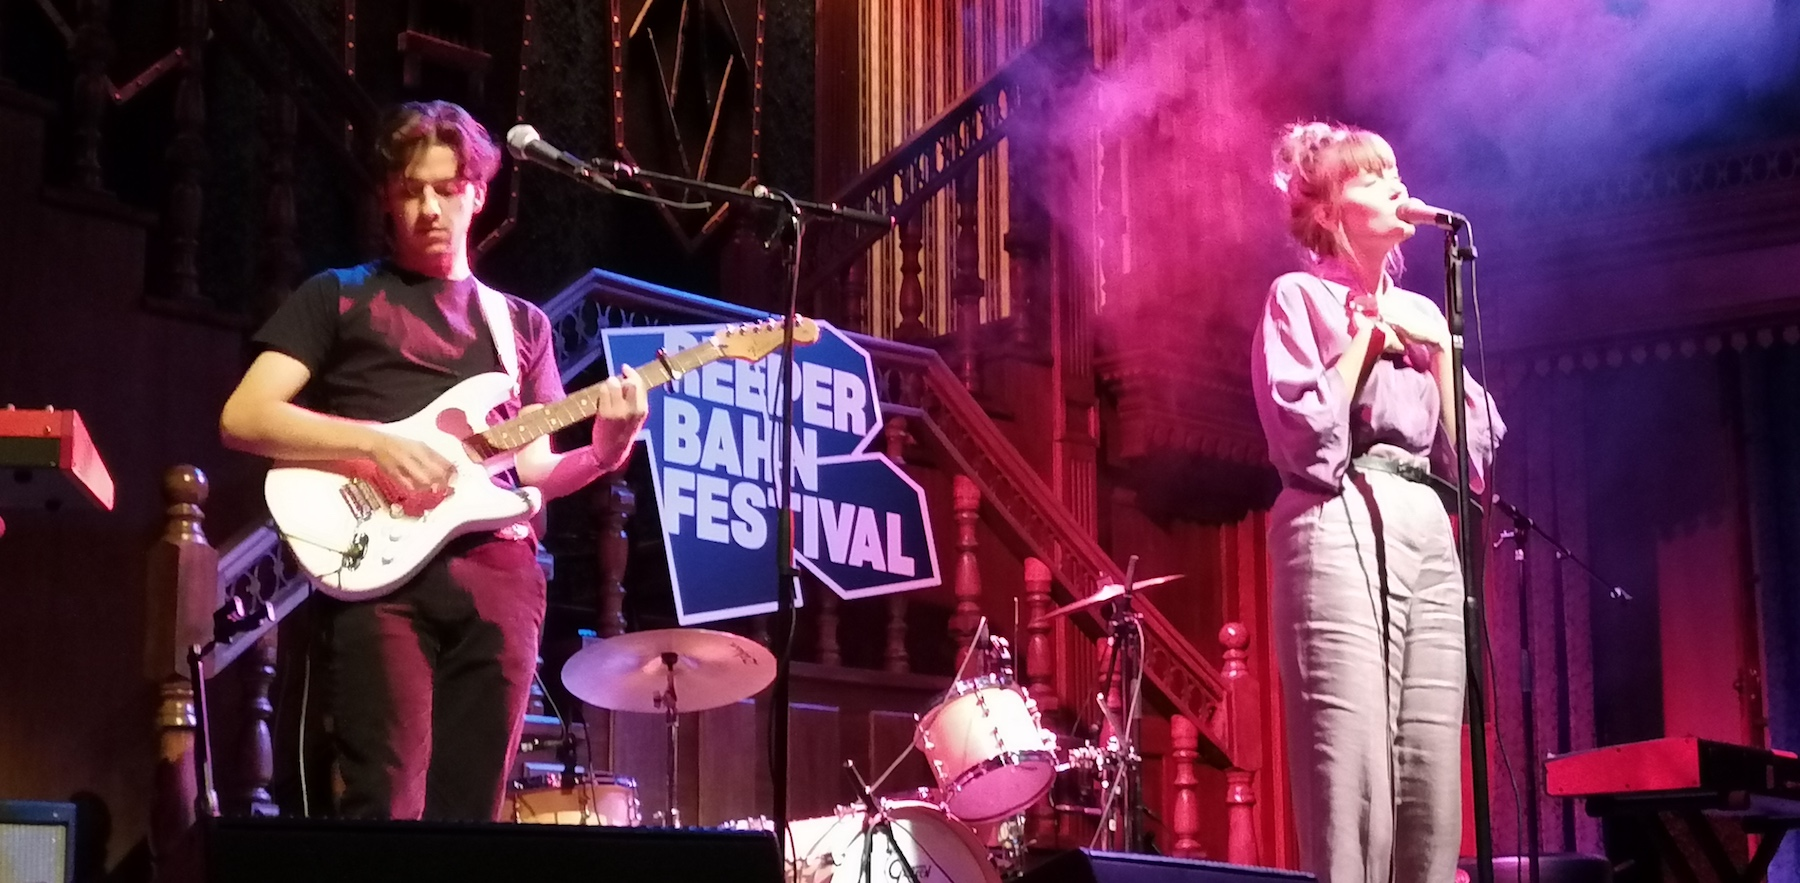 Tara_Nome_Doyle_Reeperbahn_Festival